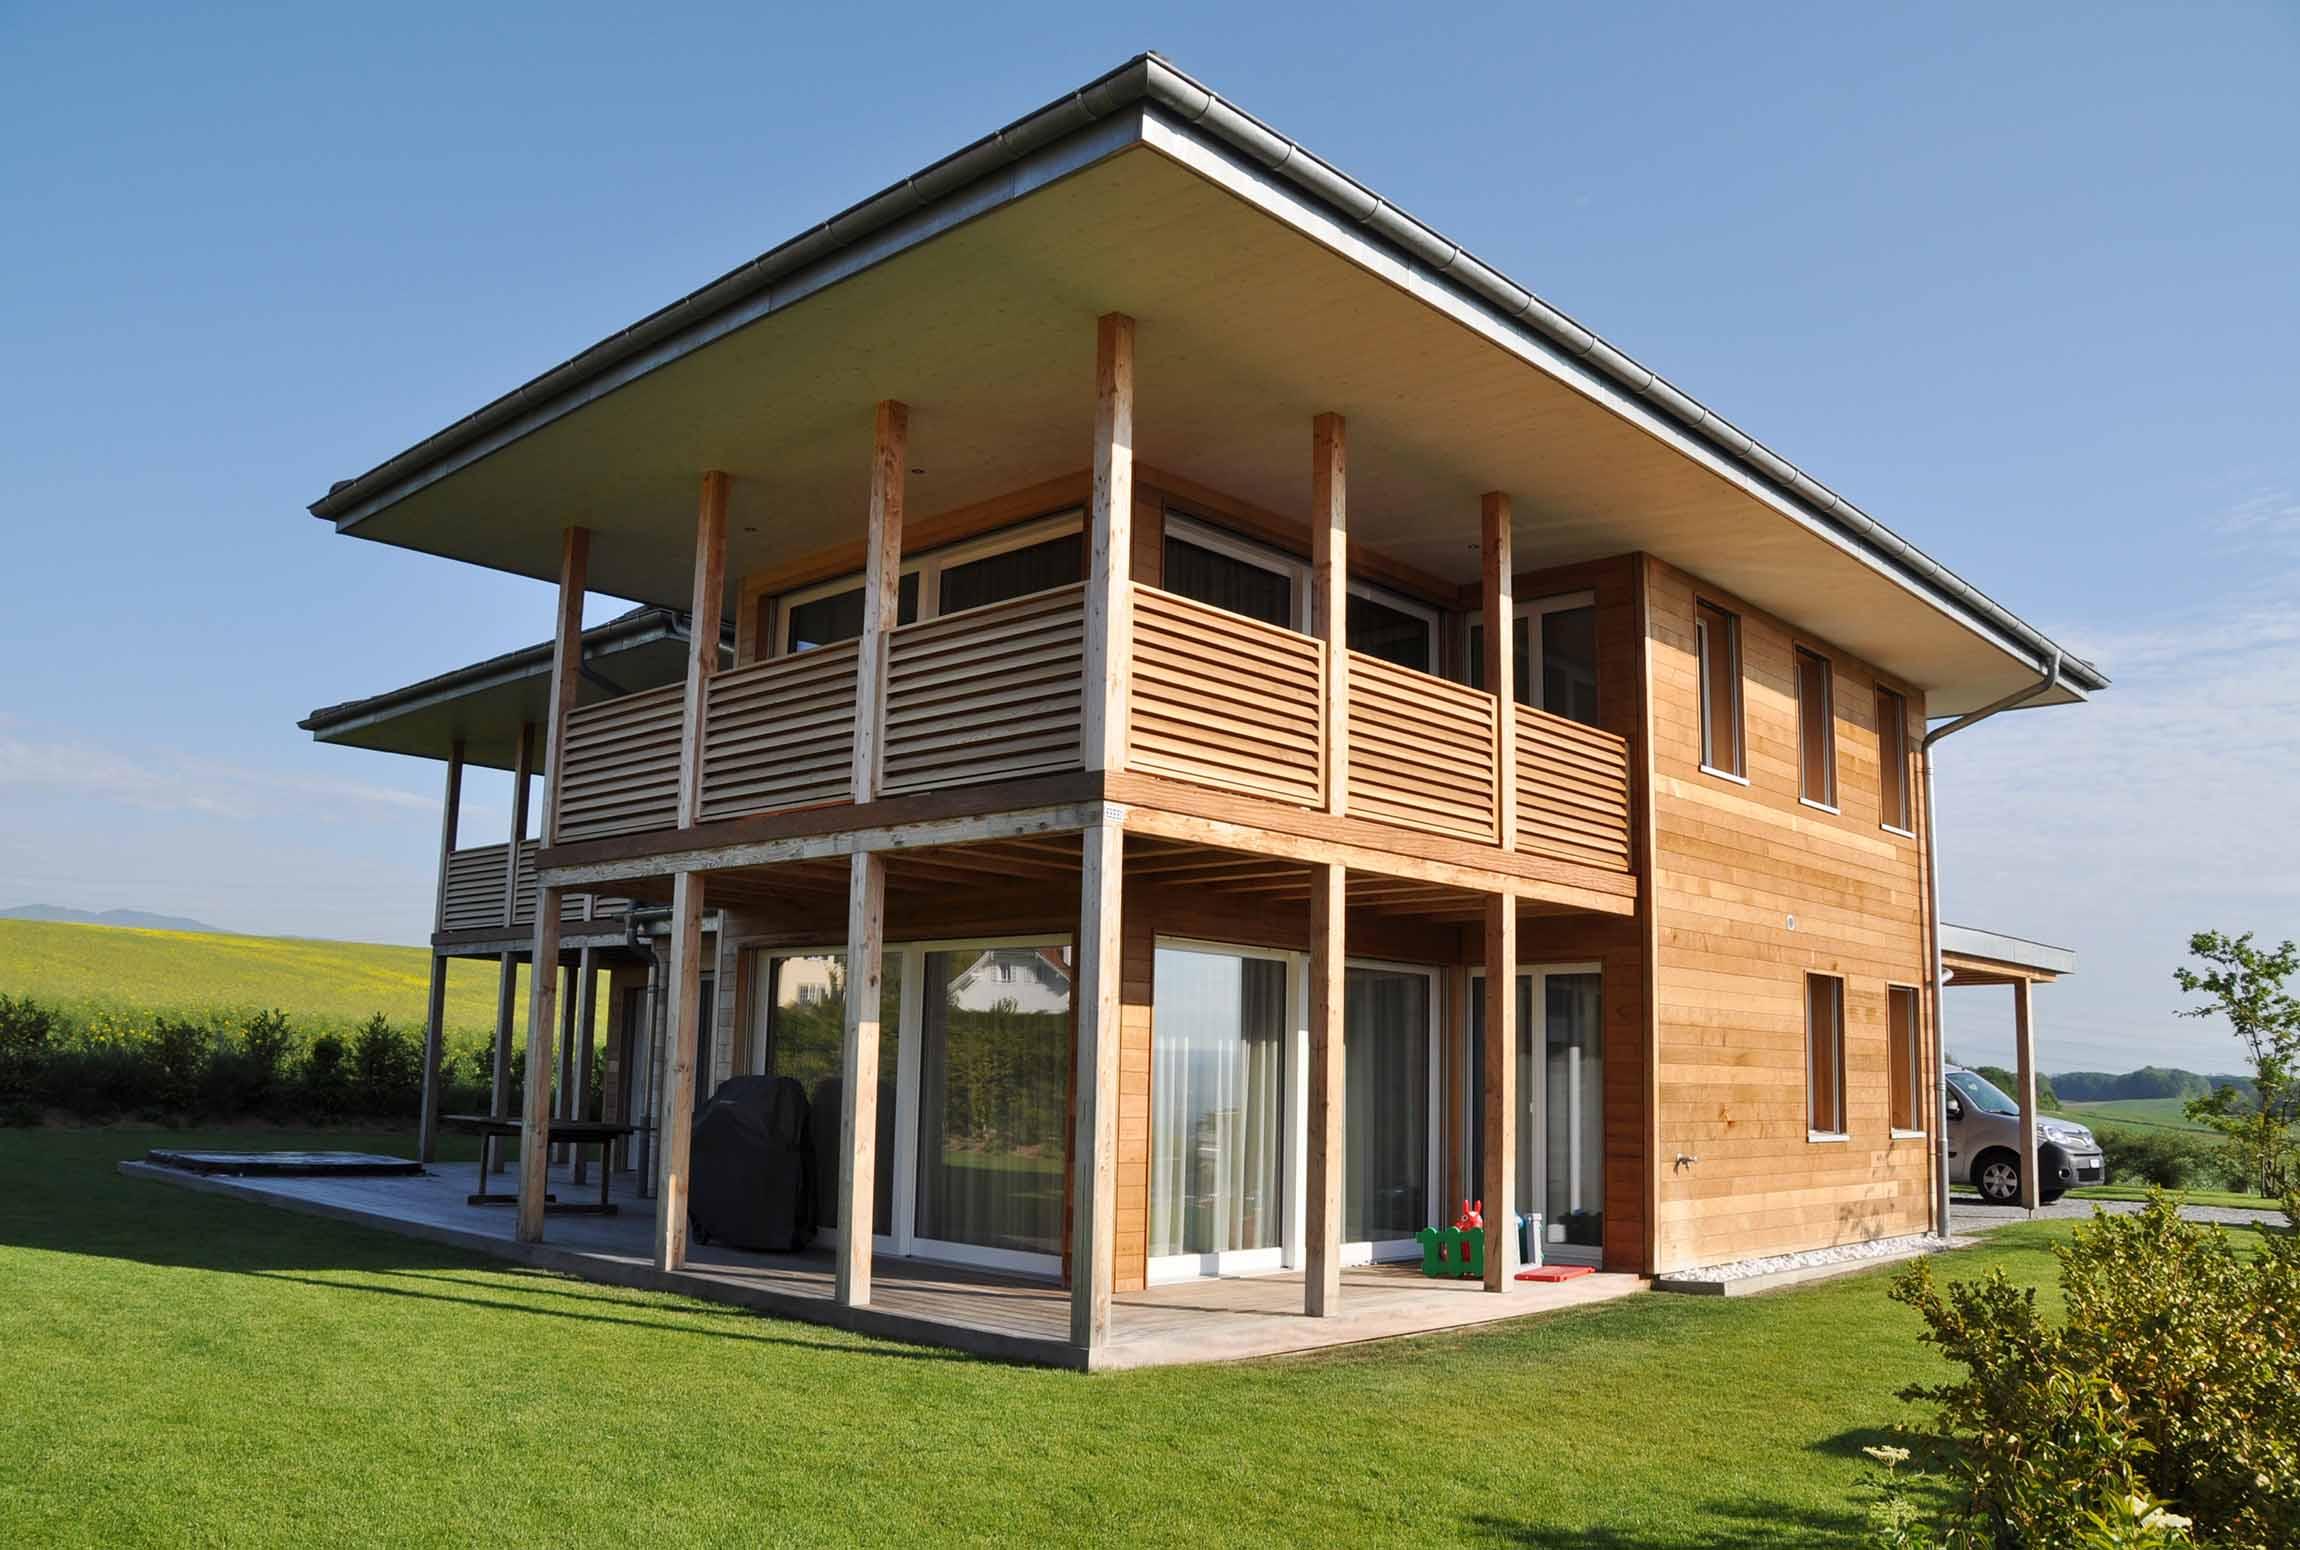 Charpente gebhardt sa for Villa ossature bois